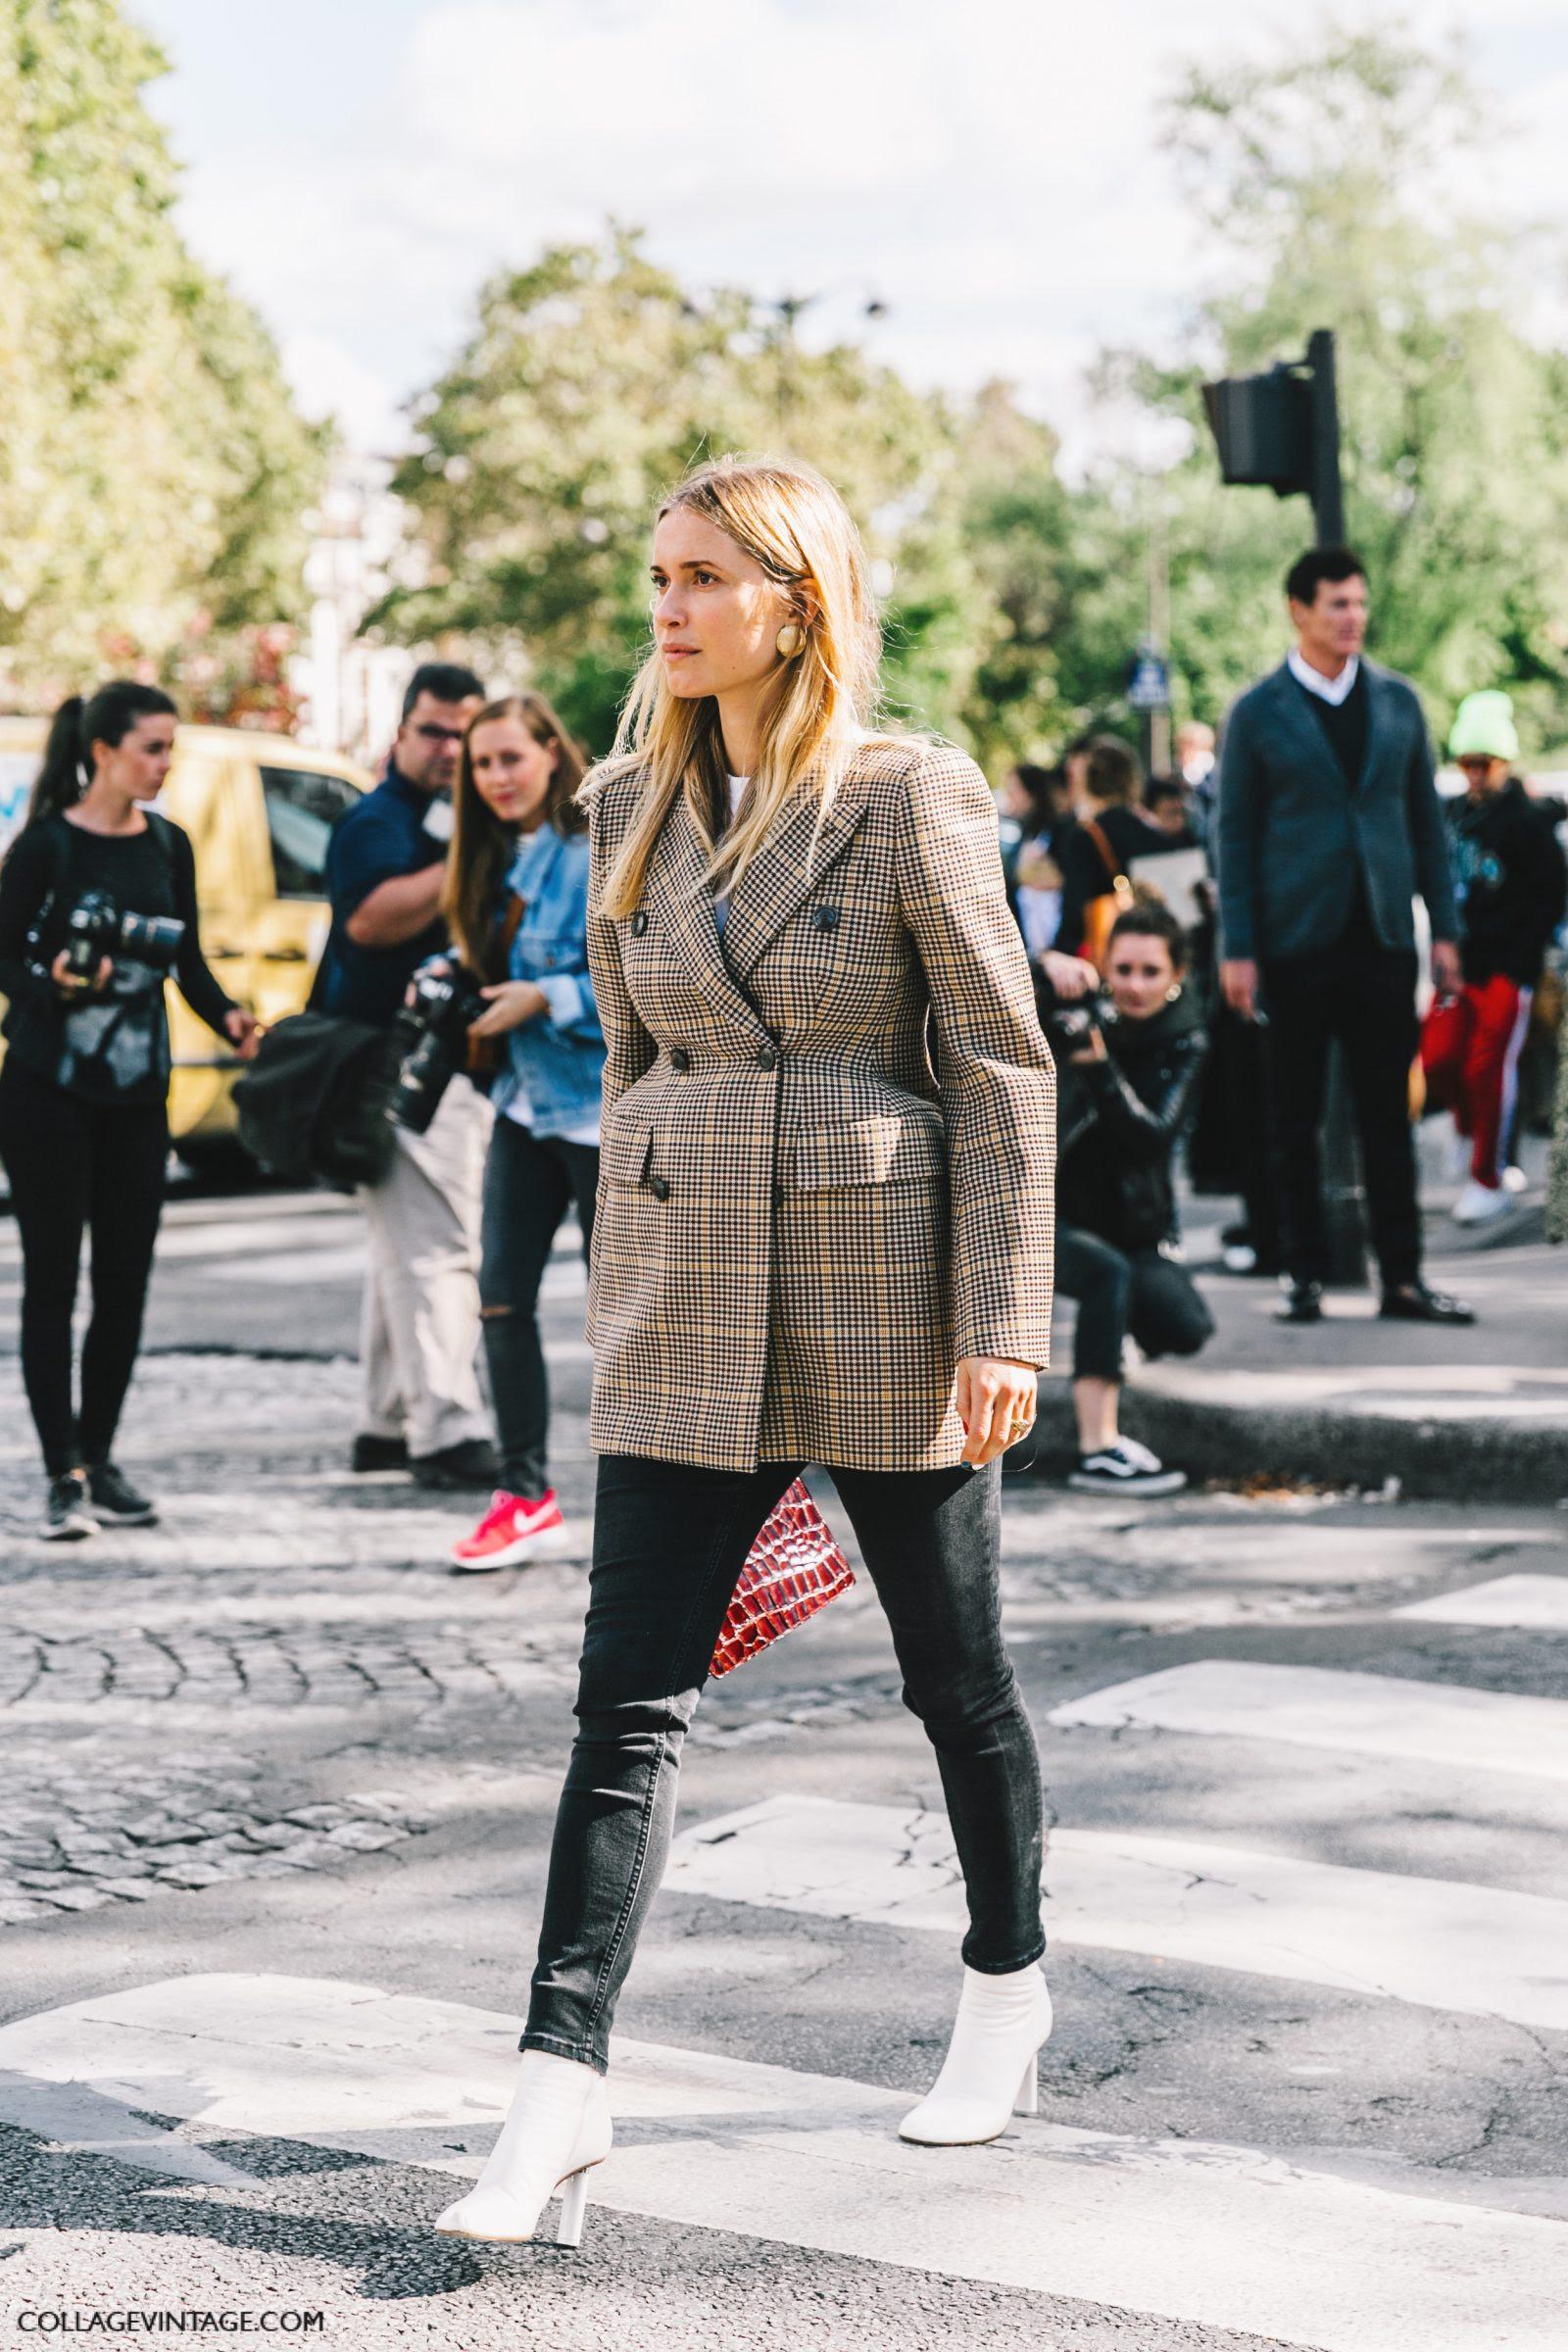 pfw-paris_fashion_week_ss17-street_style-outfits-collage_vintage-valentino-balenciaga-celine-78